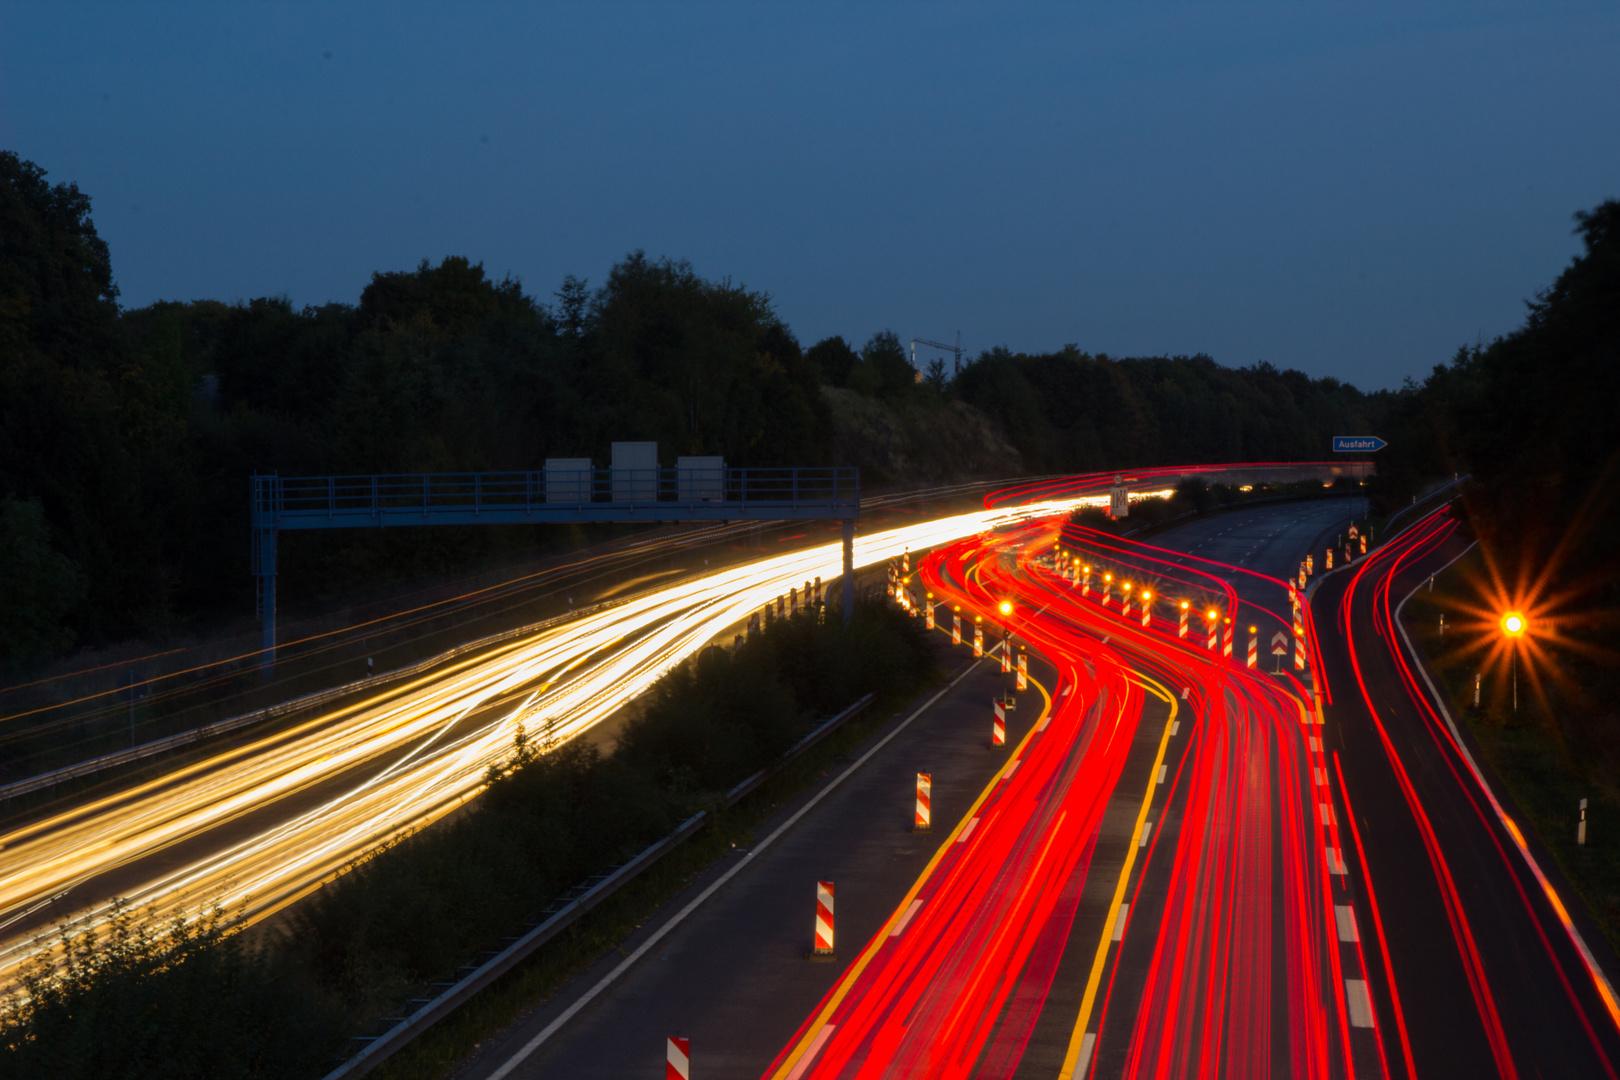 Autobahn, verdammt viel los...